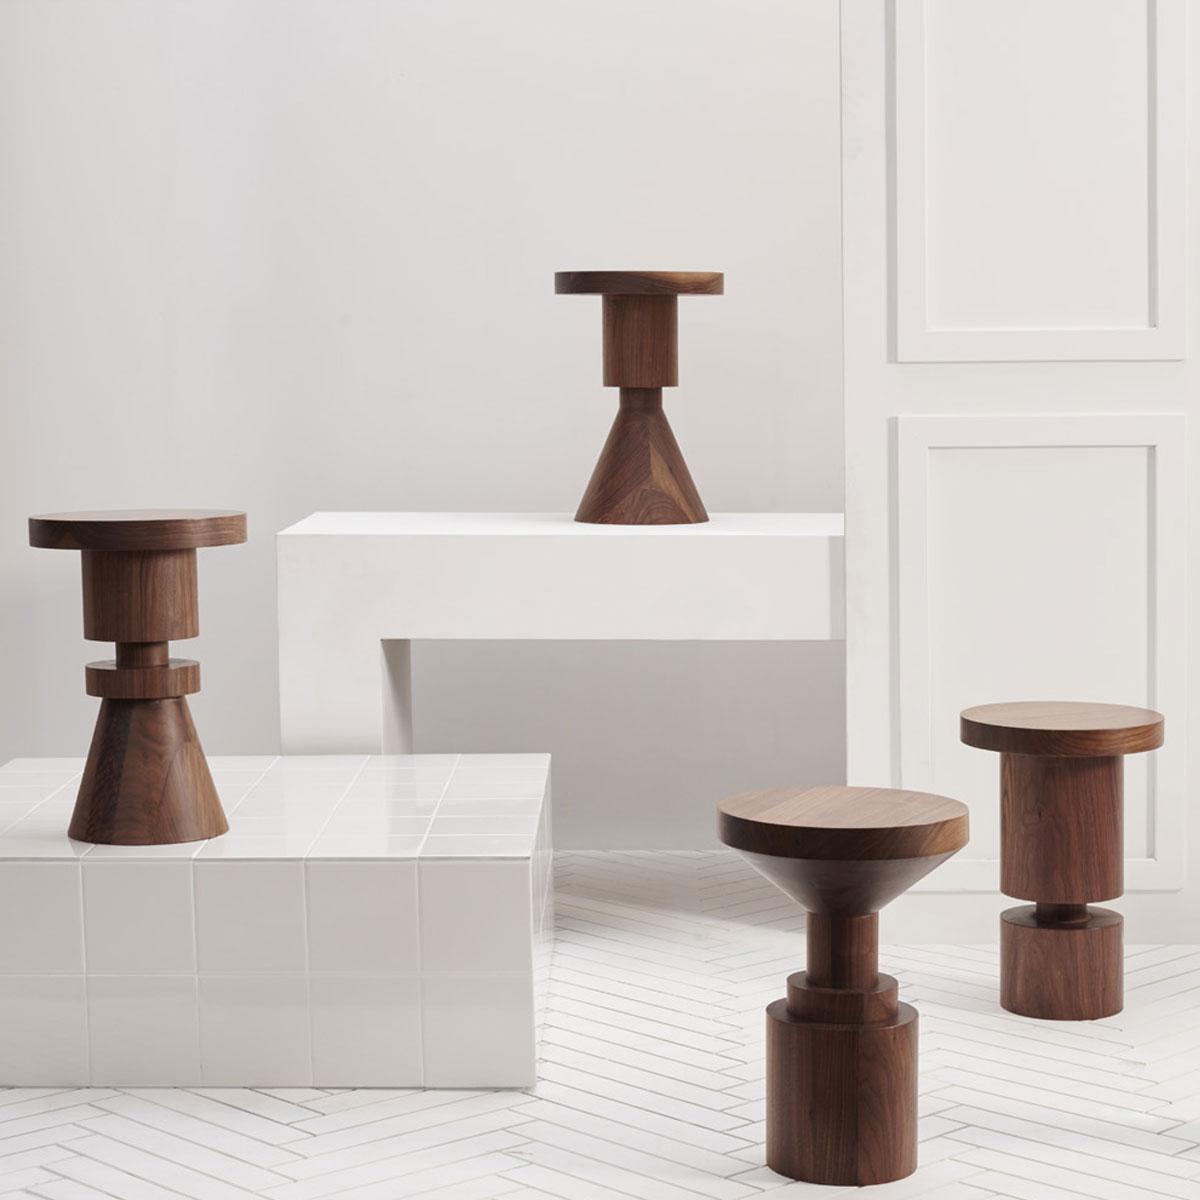 anna-karlin-wooden-chess-stool-tabouret-design-deco-interieur1.jpg